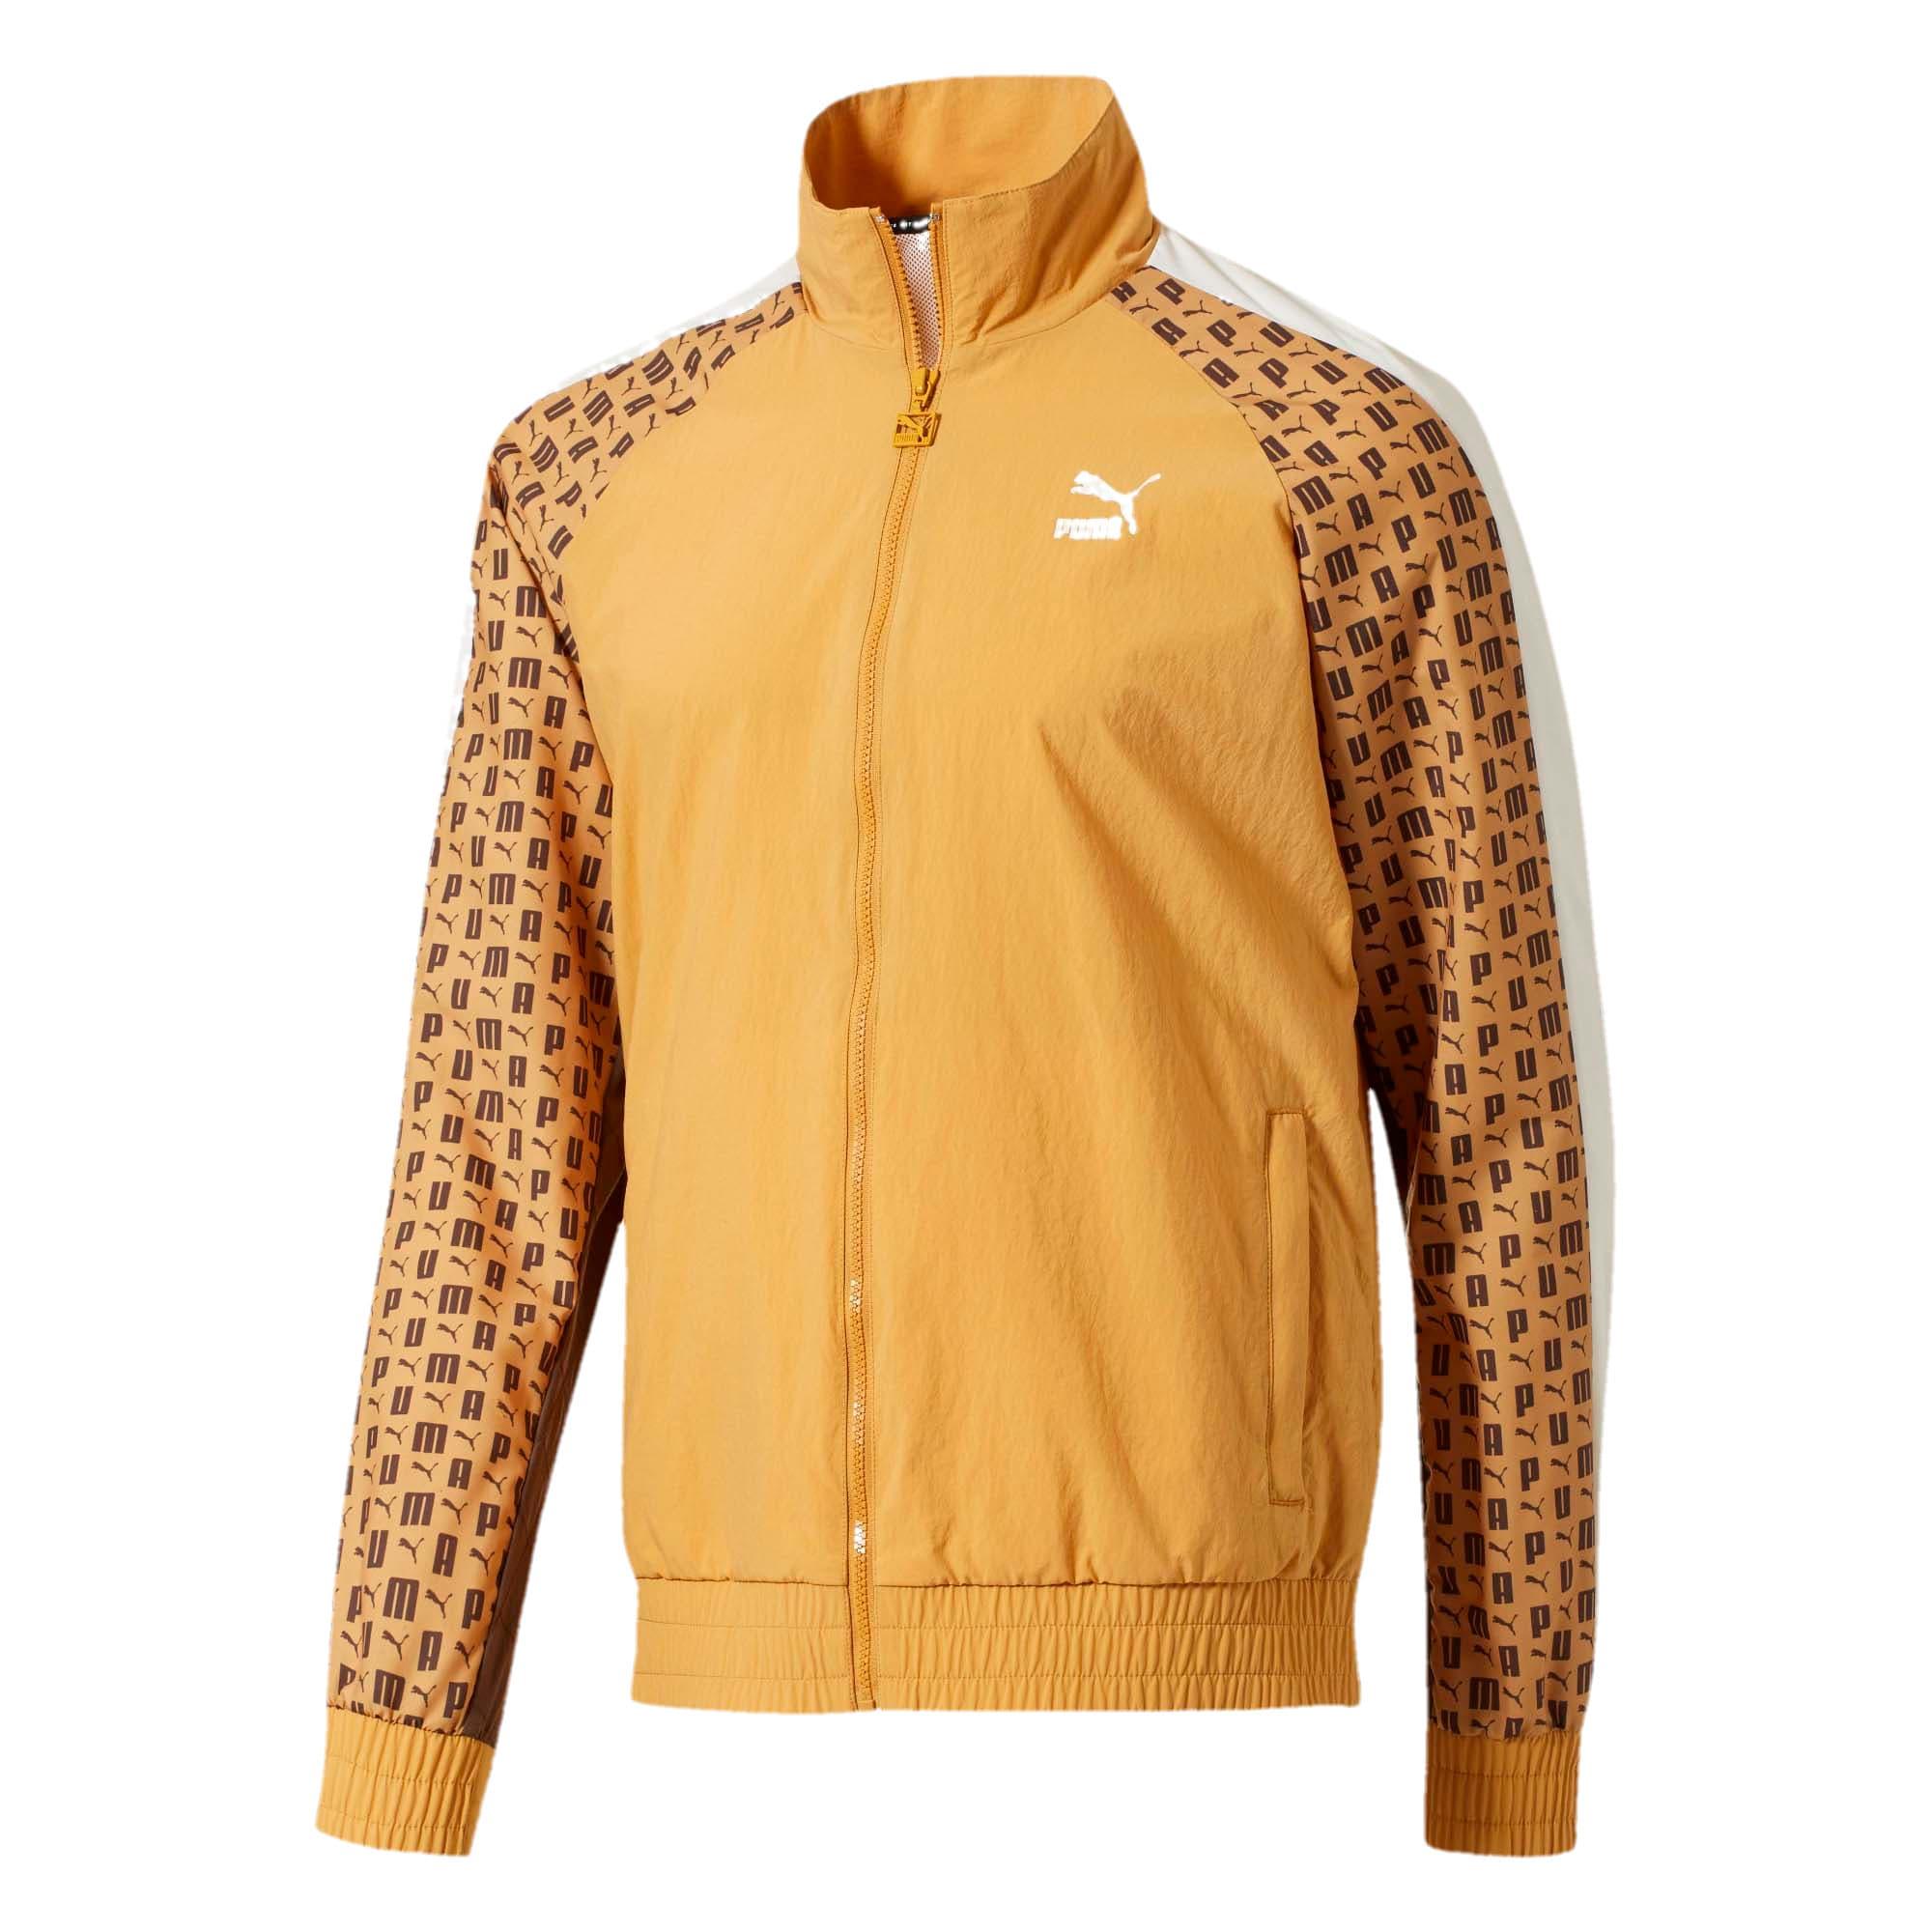 Thumbnail 1 of Lux Woven T7 Track Jacket, Hny Mstrd-Whspr Wht-Chc Brwn, medium